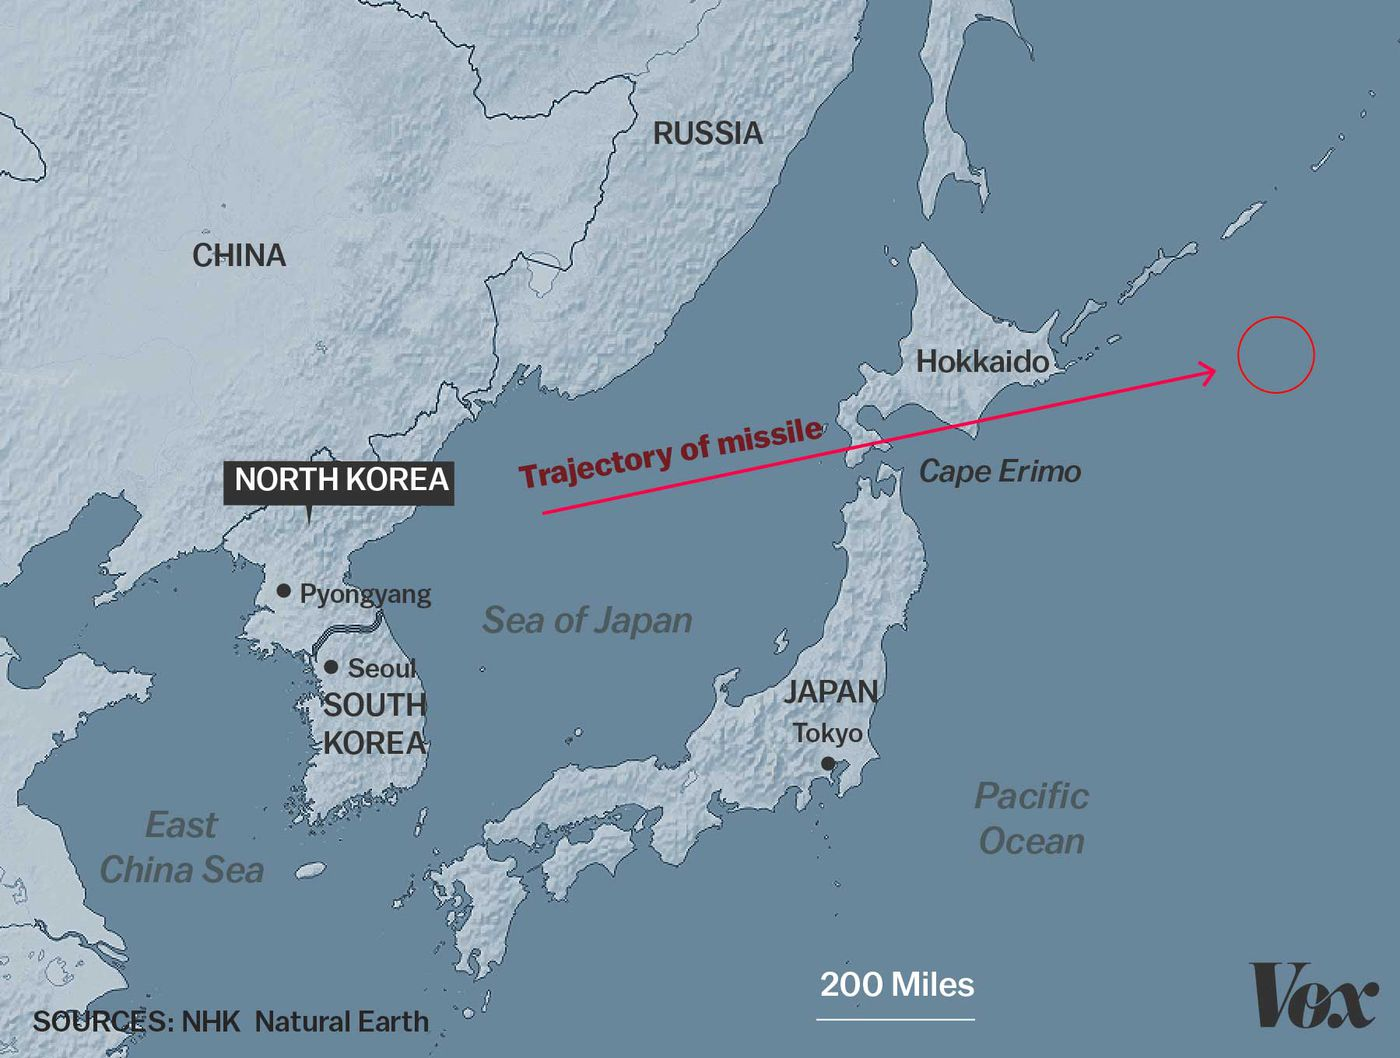 40 maps that explain North Korea - Vox